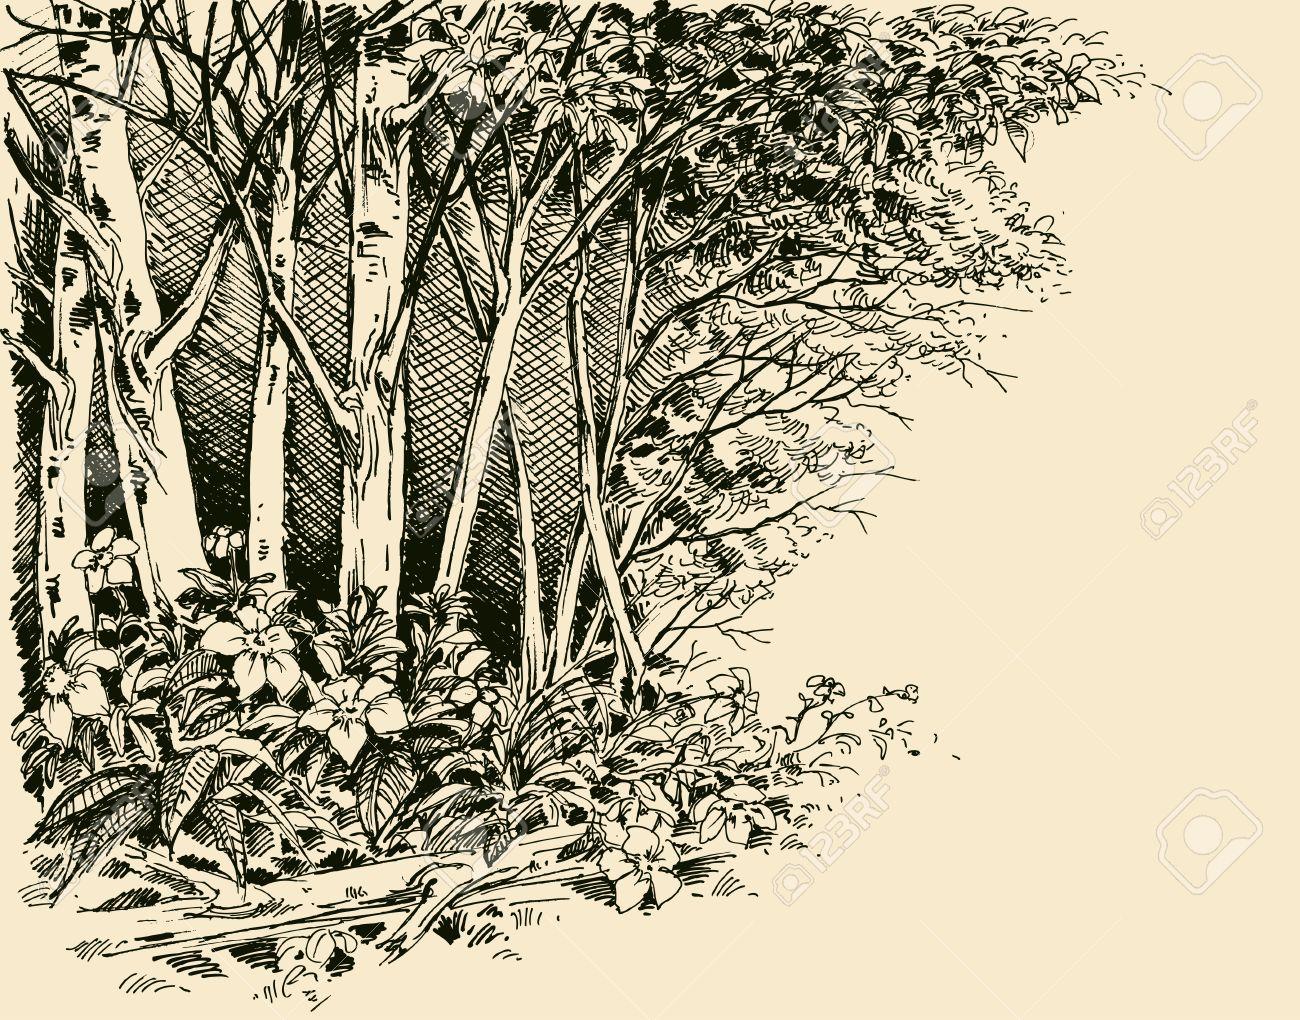 Forest edge drawing, generic vegetation sketch - 58650020